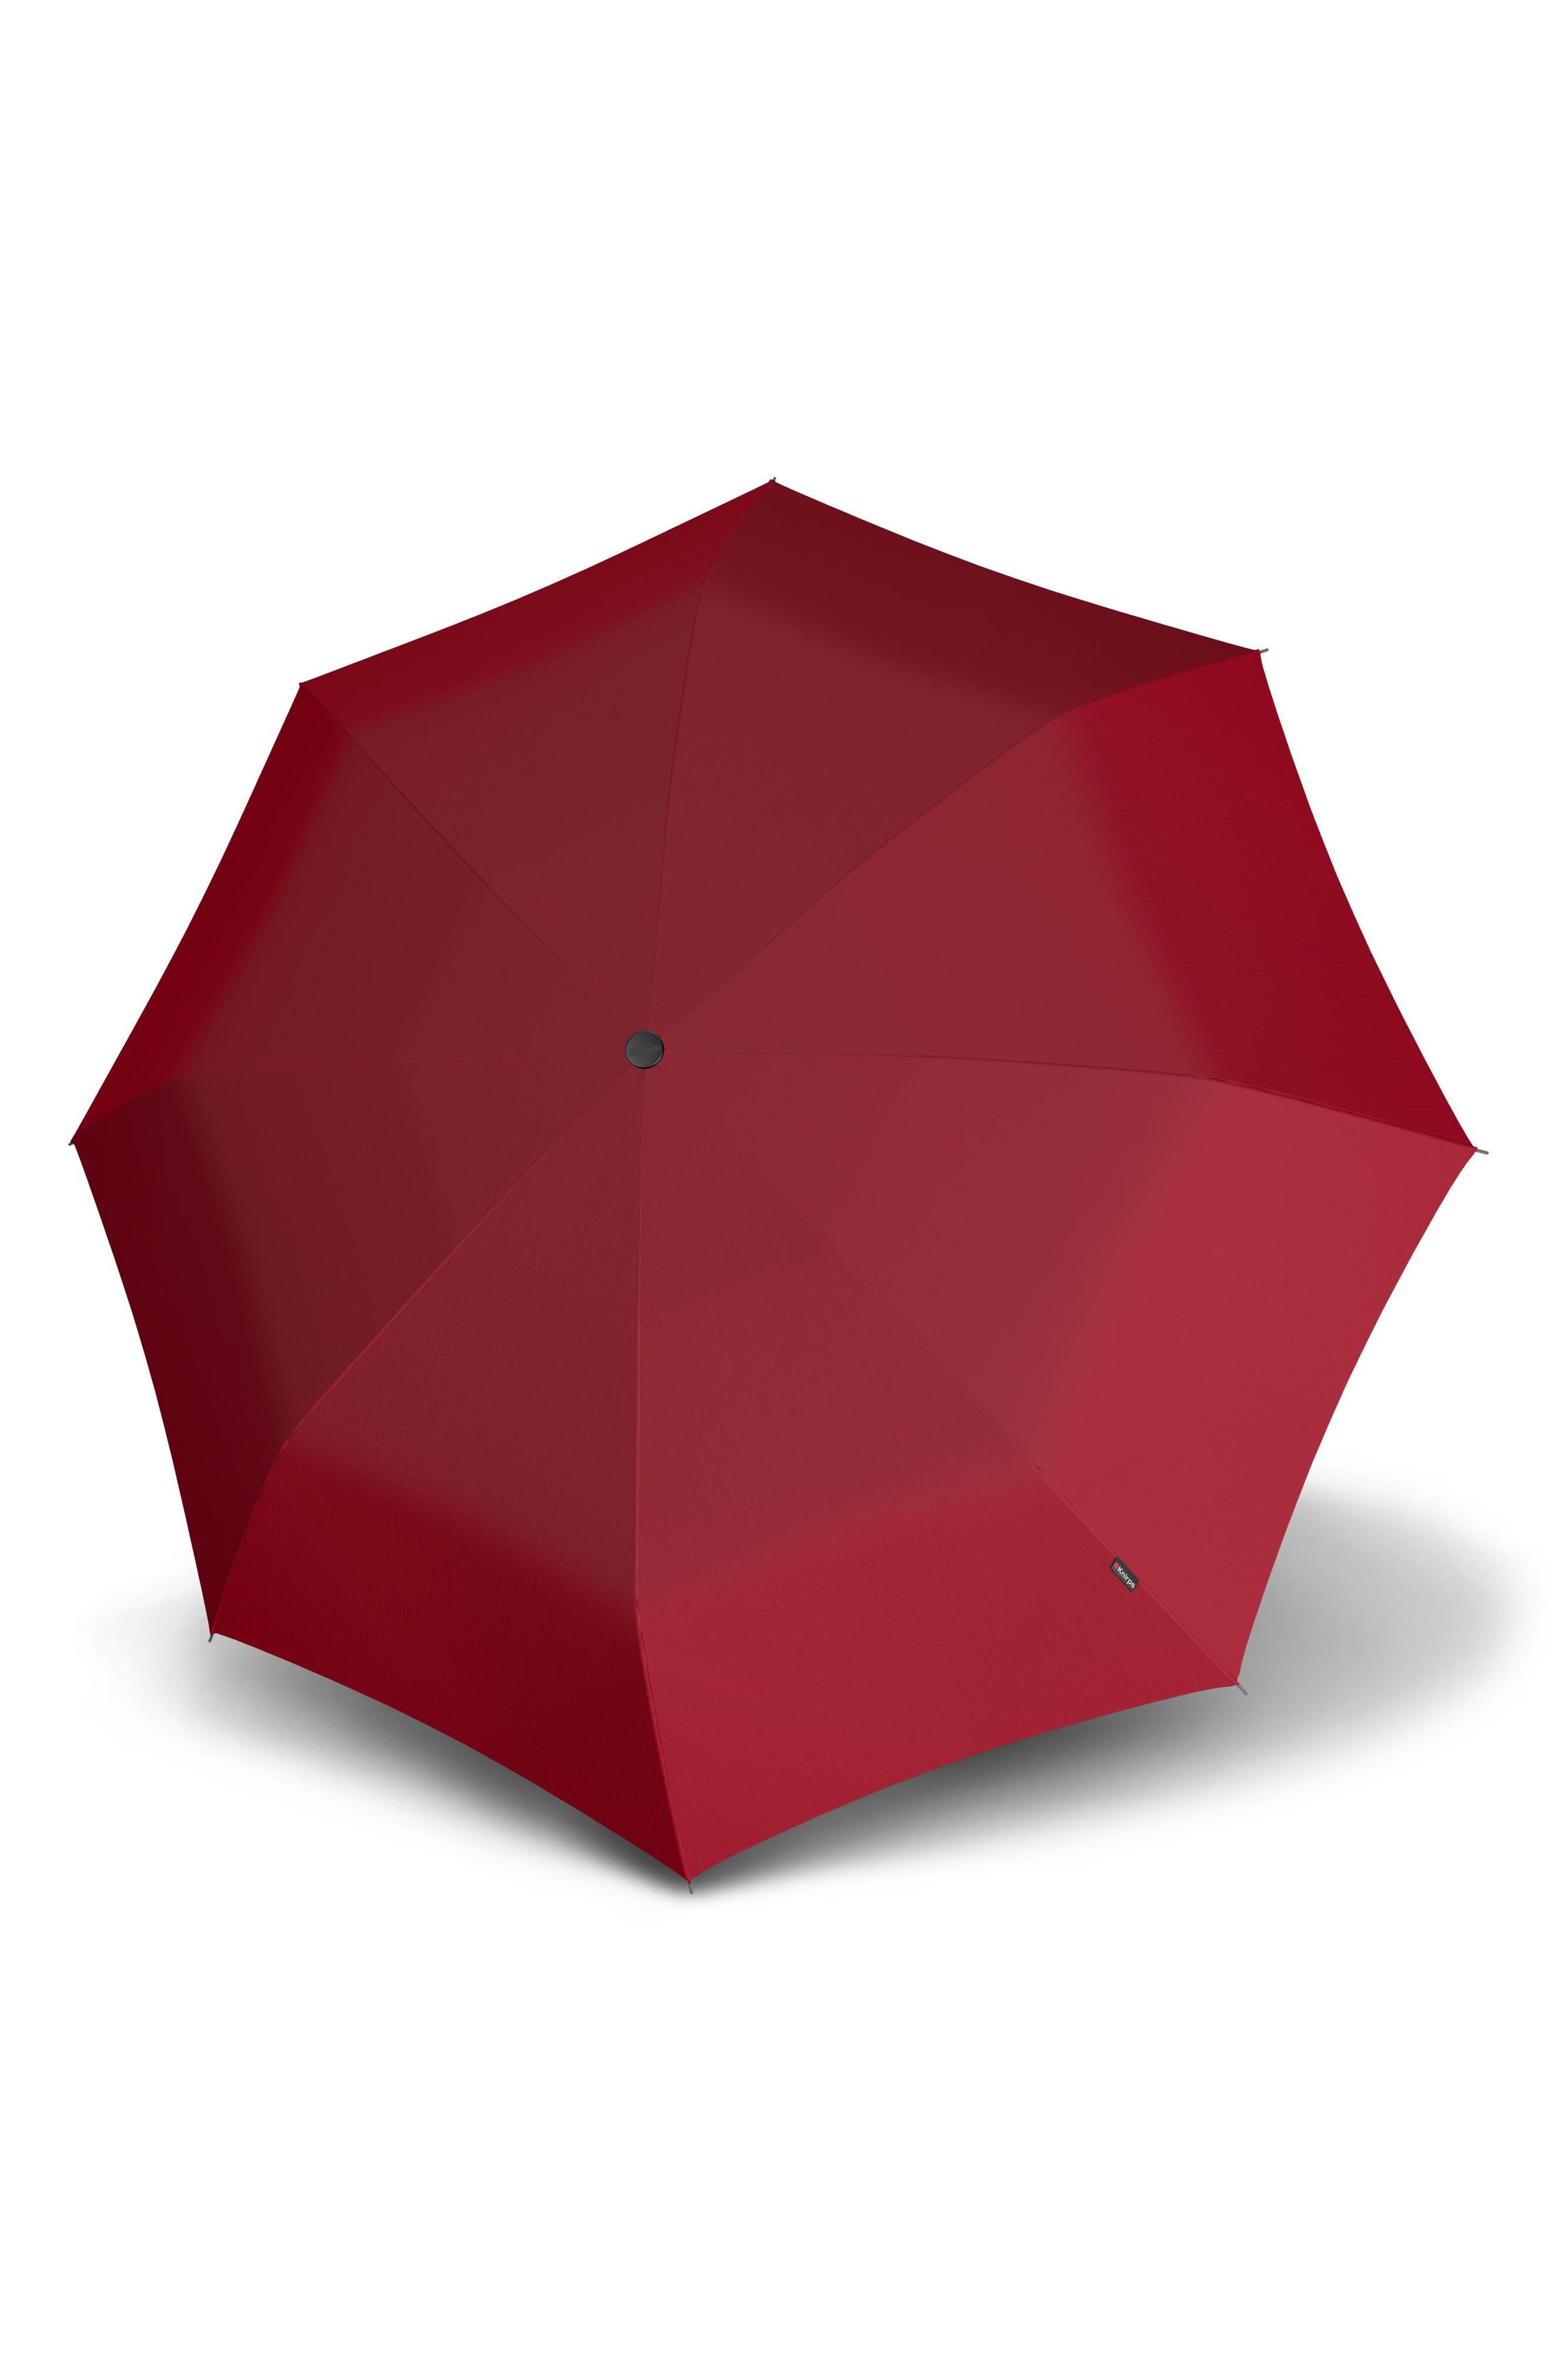 Knirps Compact Duomatic Umbrella